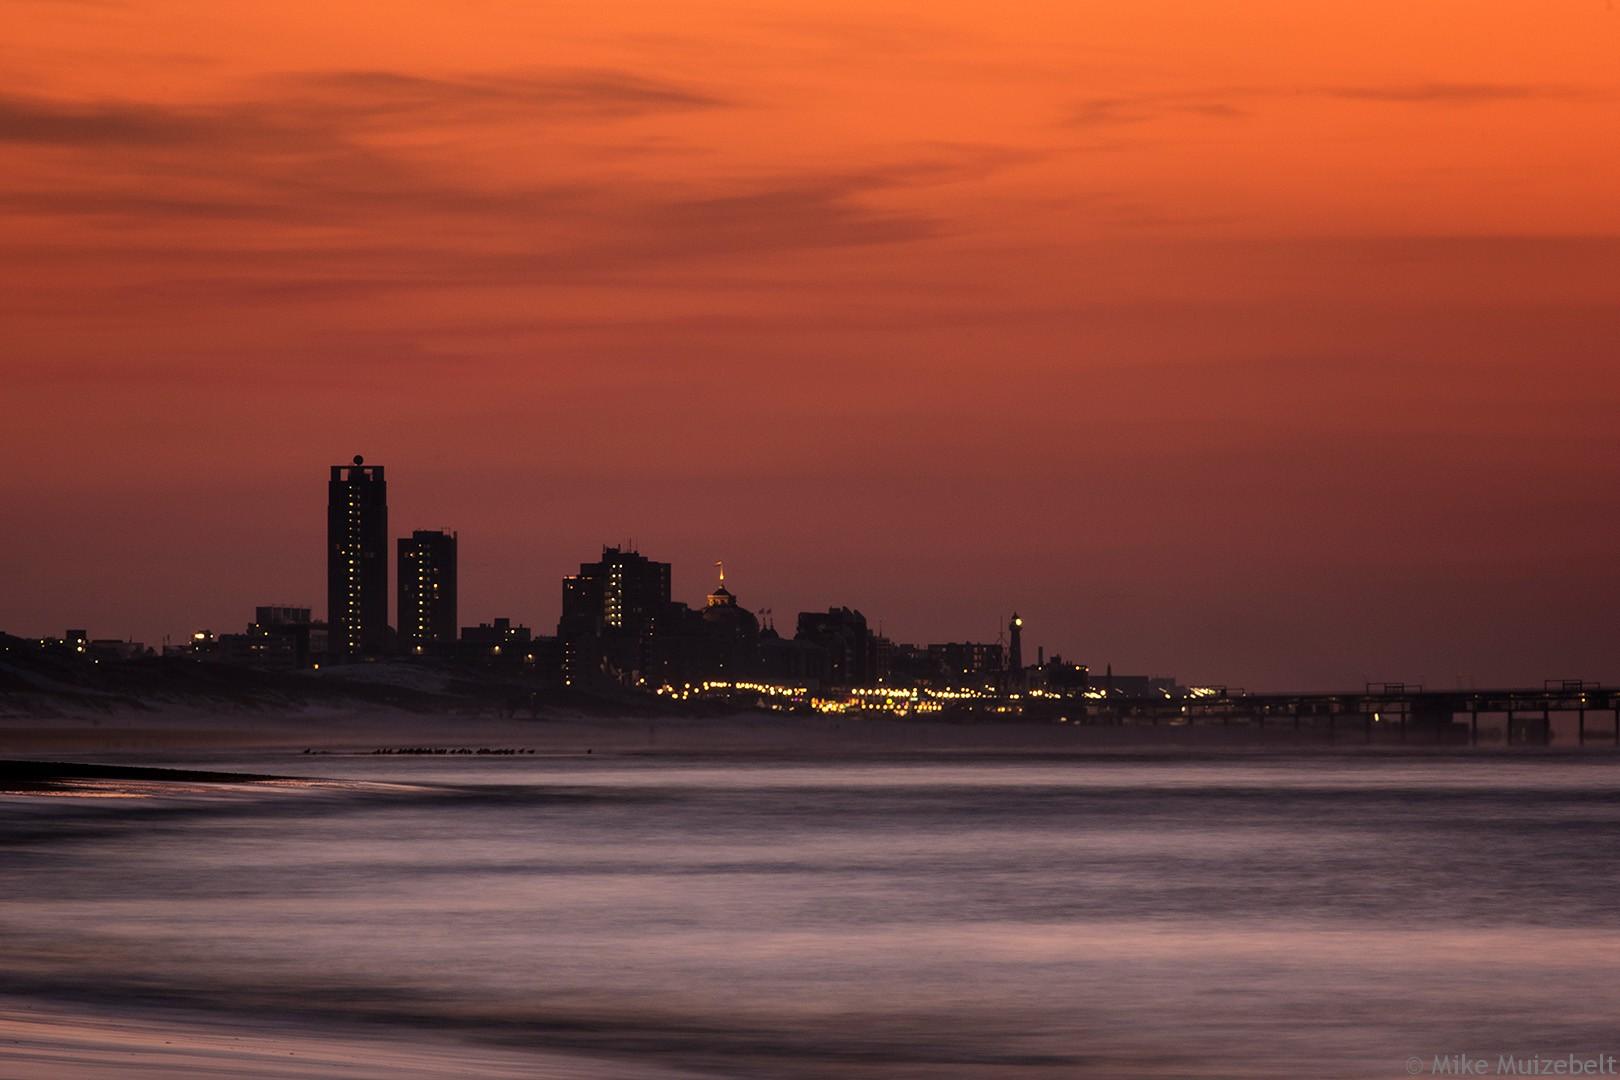 #sunset #bloodred #Scheveningen #beach #sea #ocean